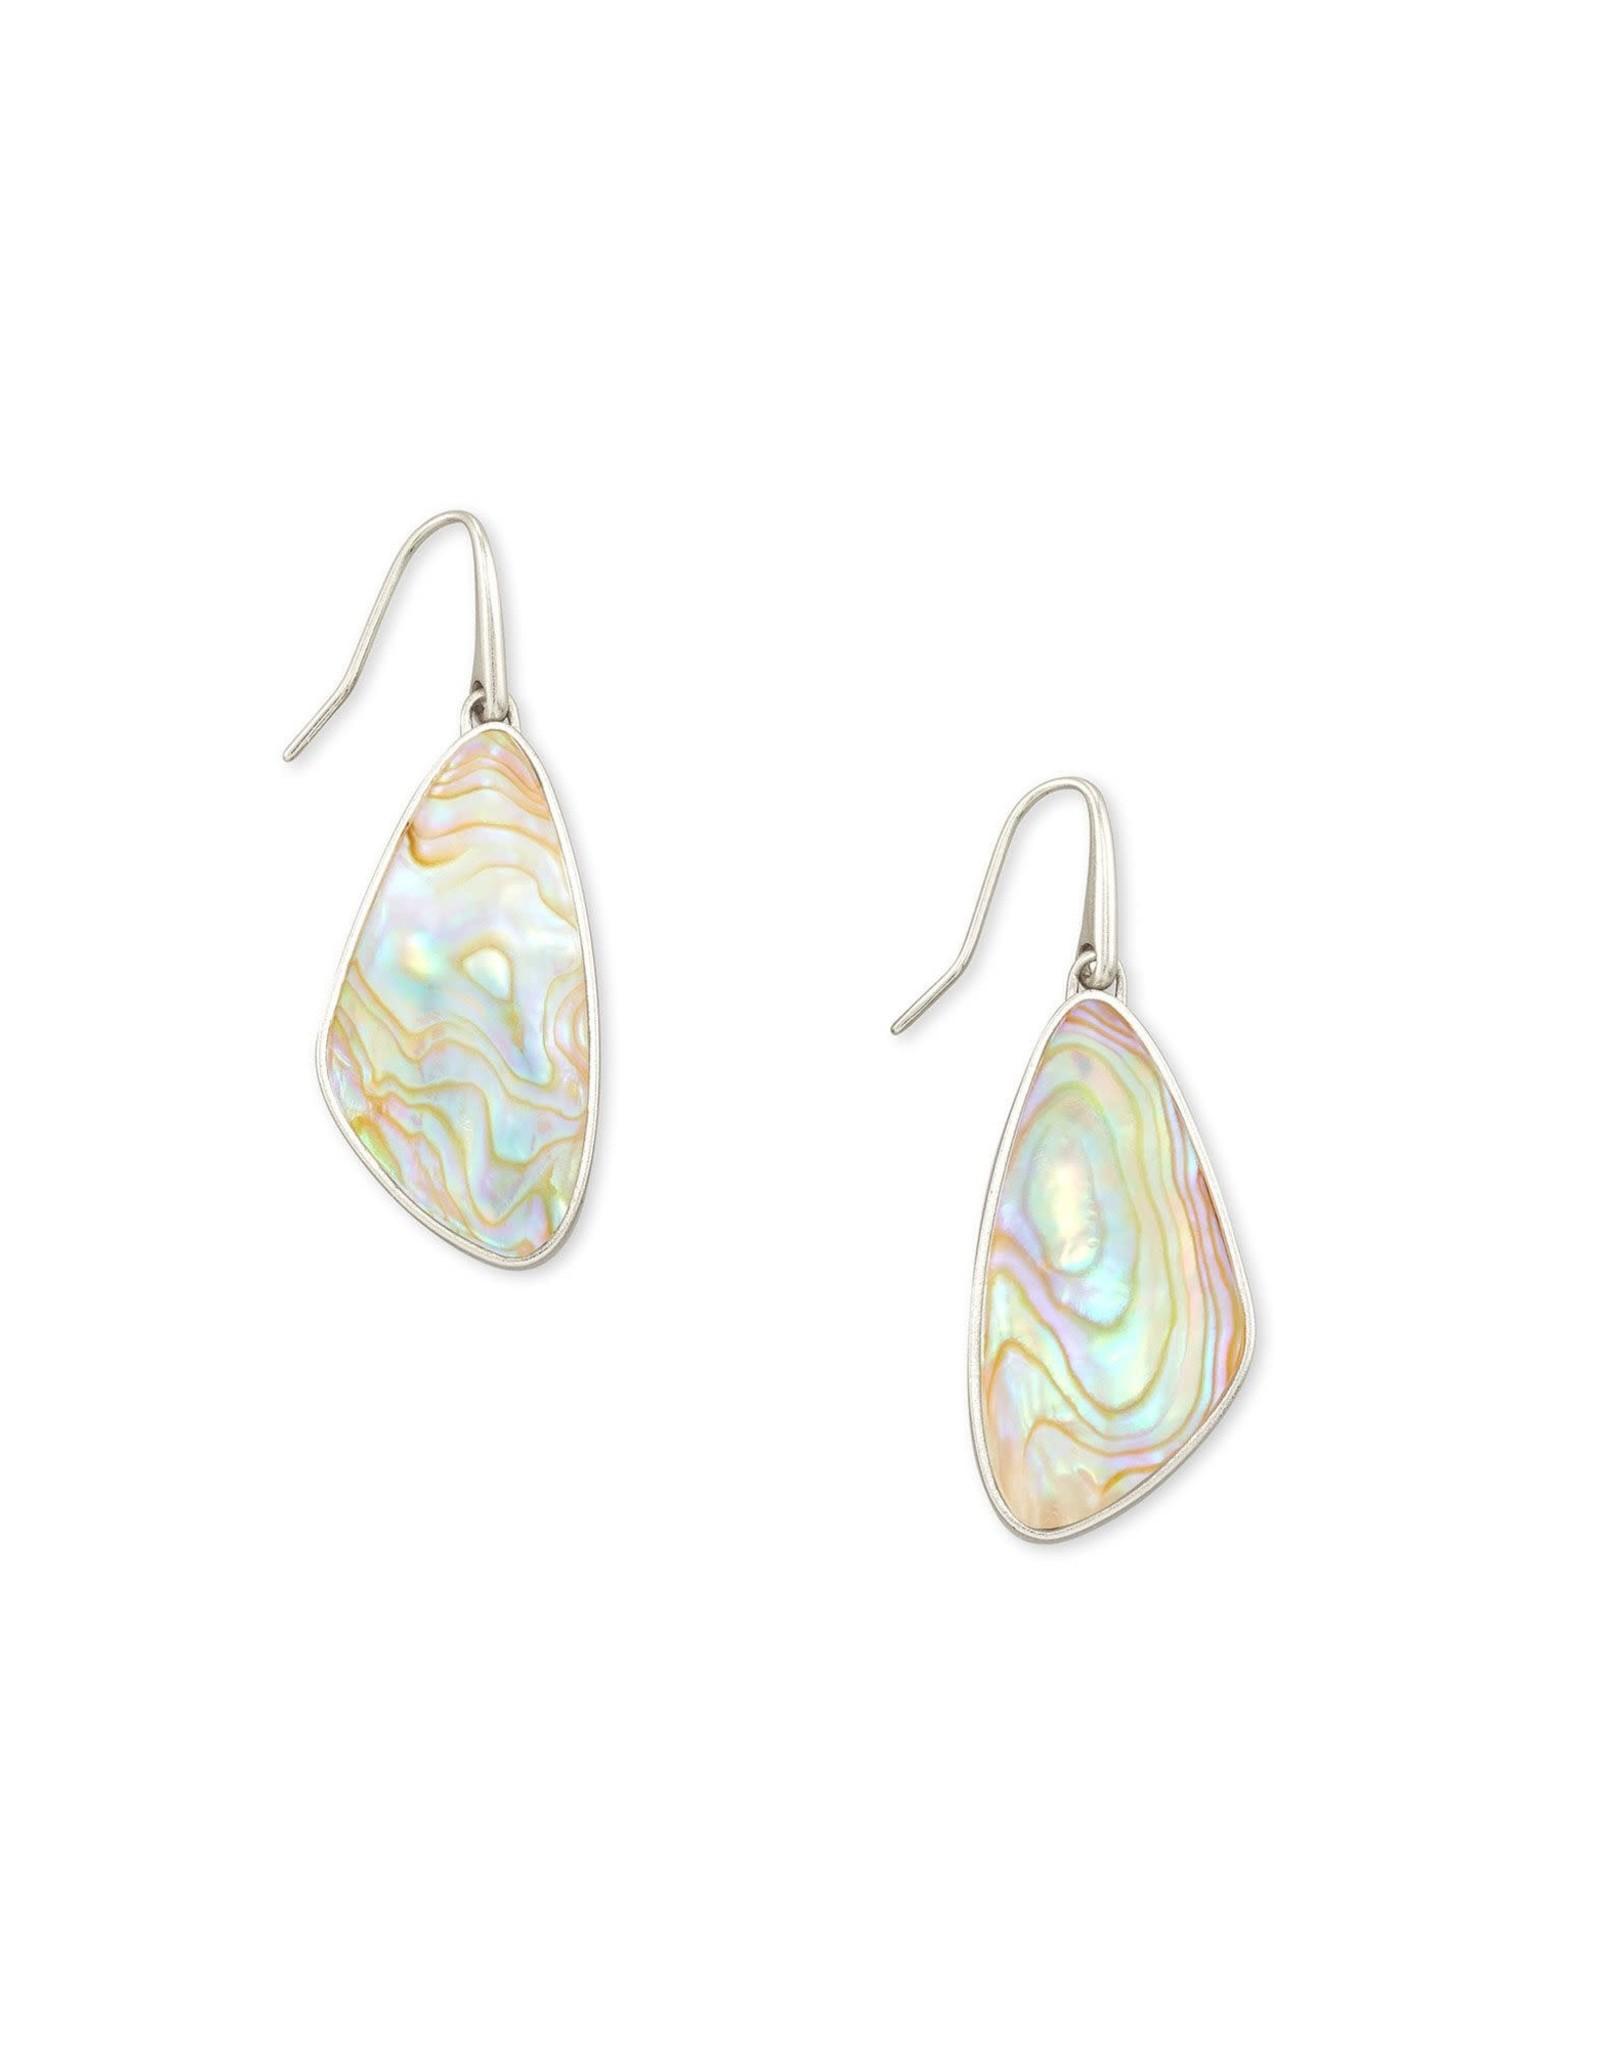 Kendra Scott McKenna Small Drop Earring - Iridescent Abalone/Rhodium